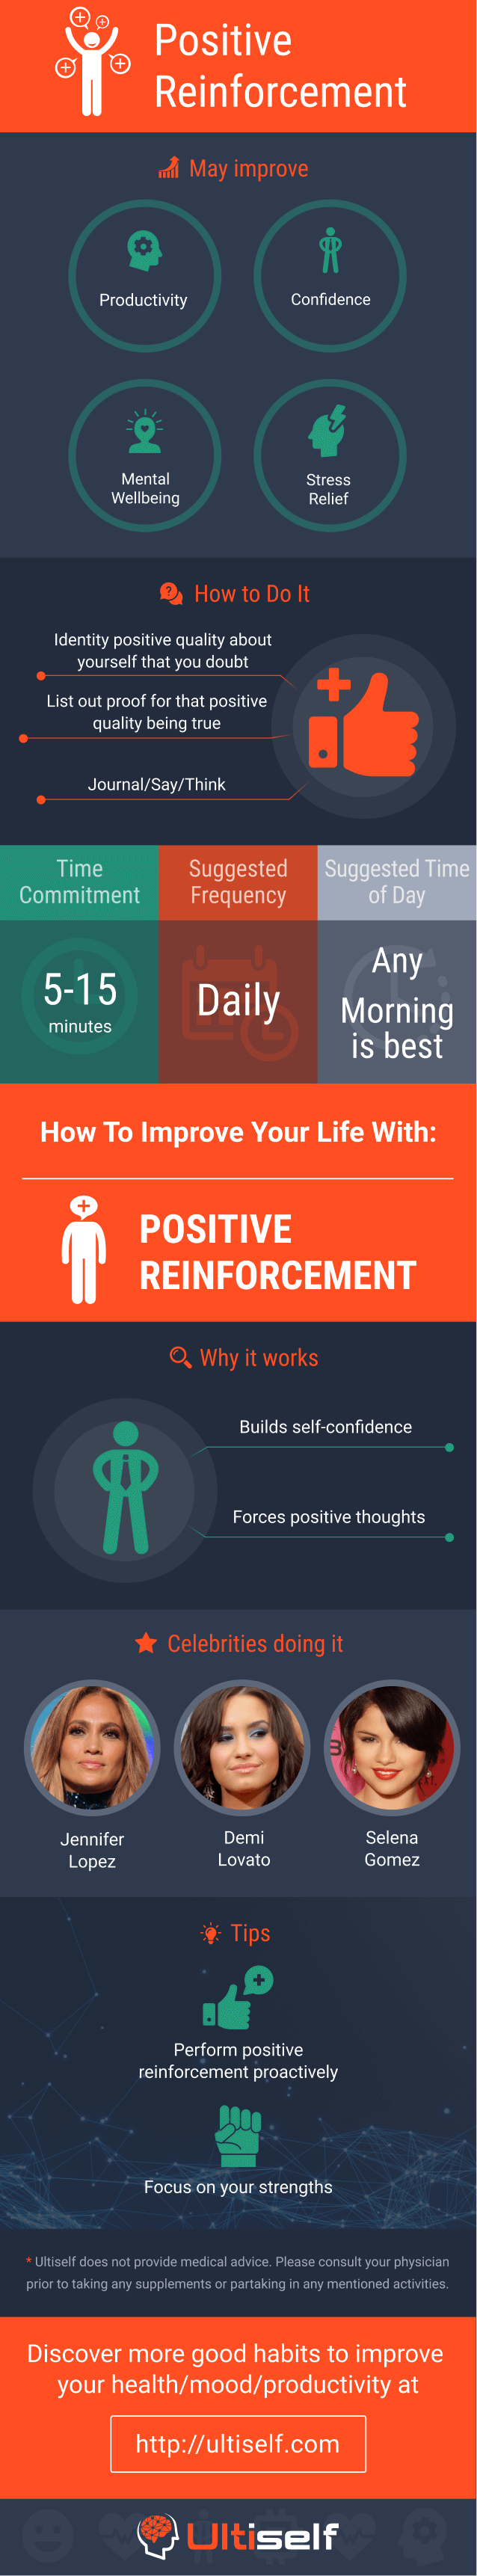 Positive Reinforcement infographic